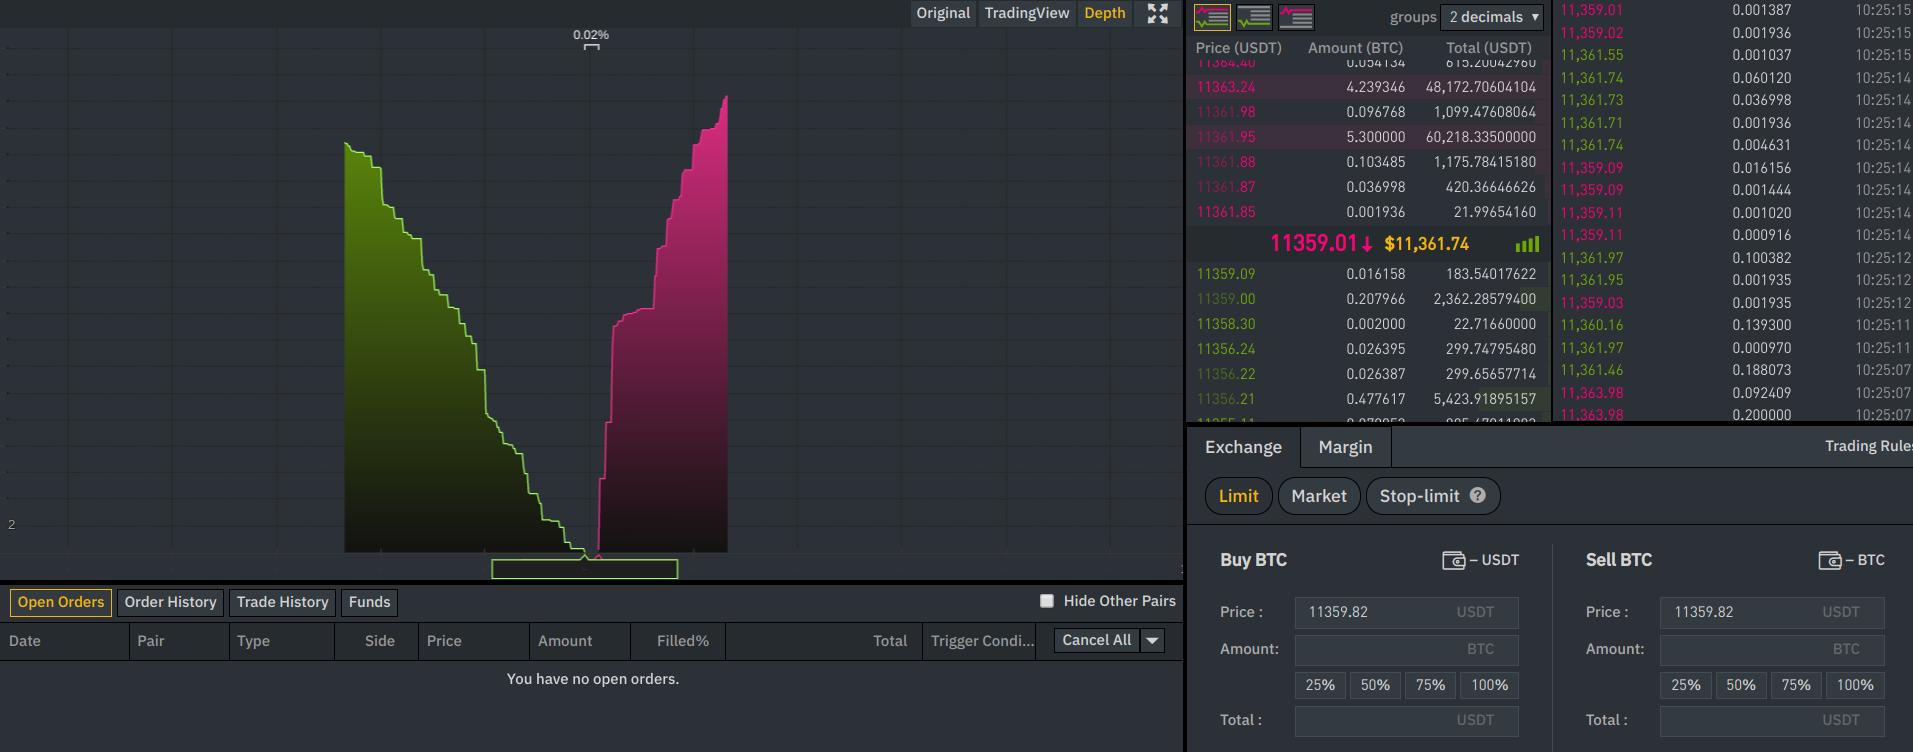 the market depth of binance